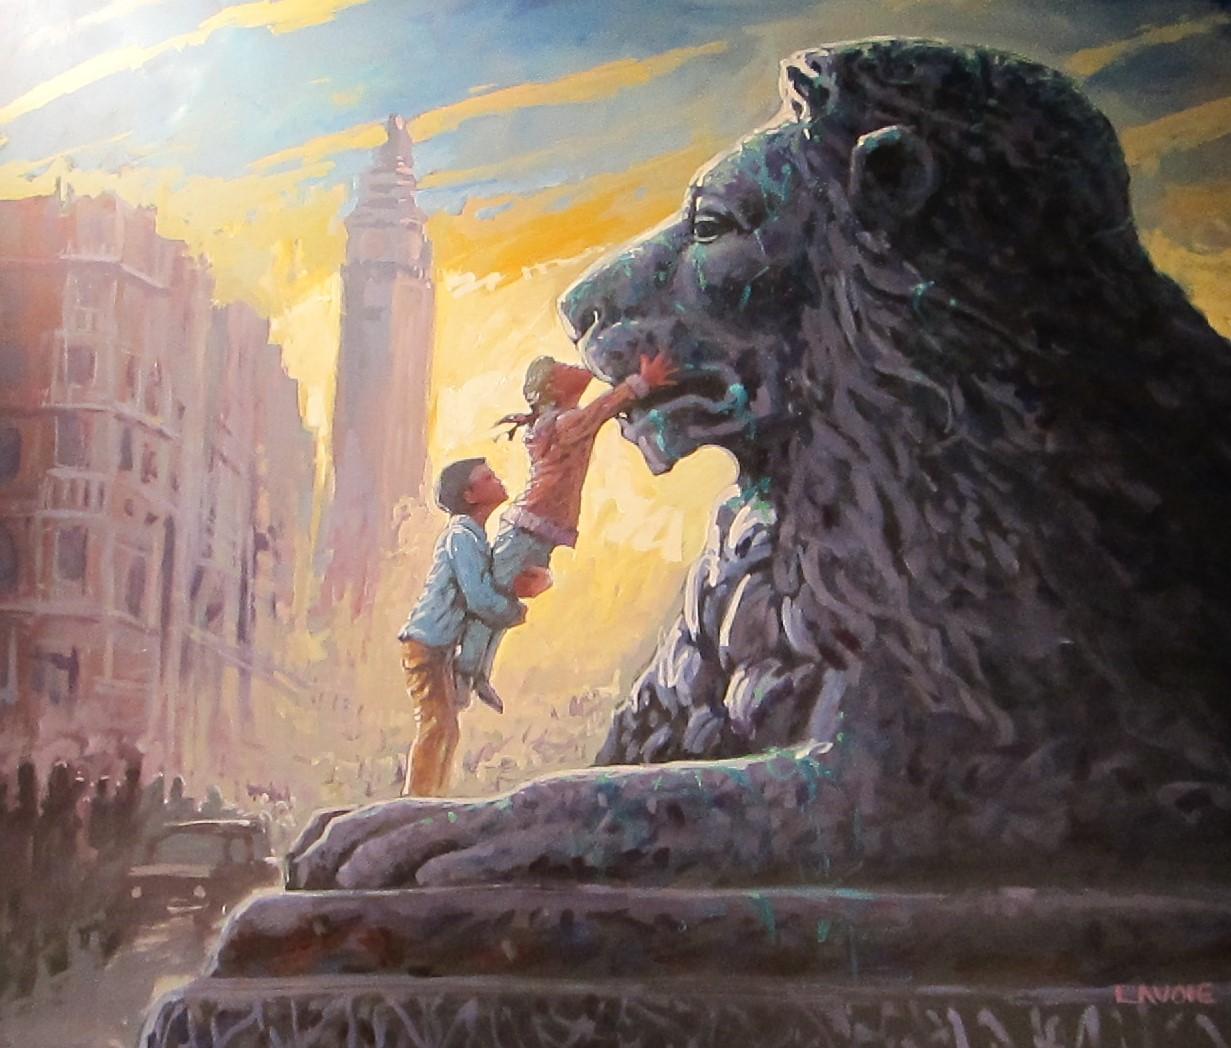 The Lion KIng Live Art